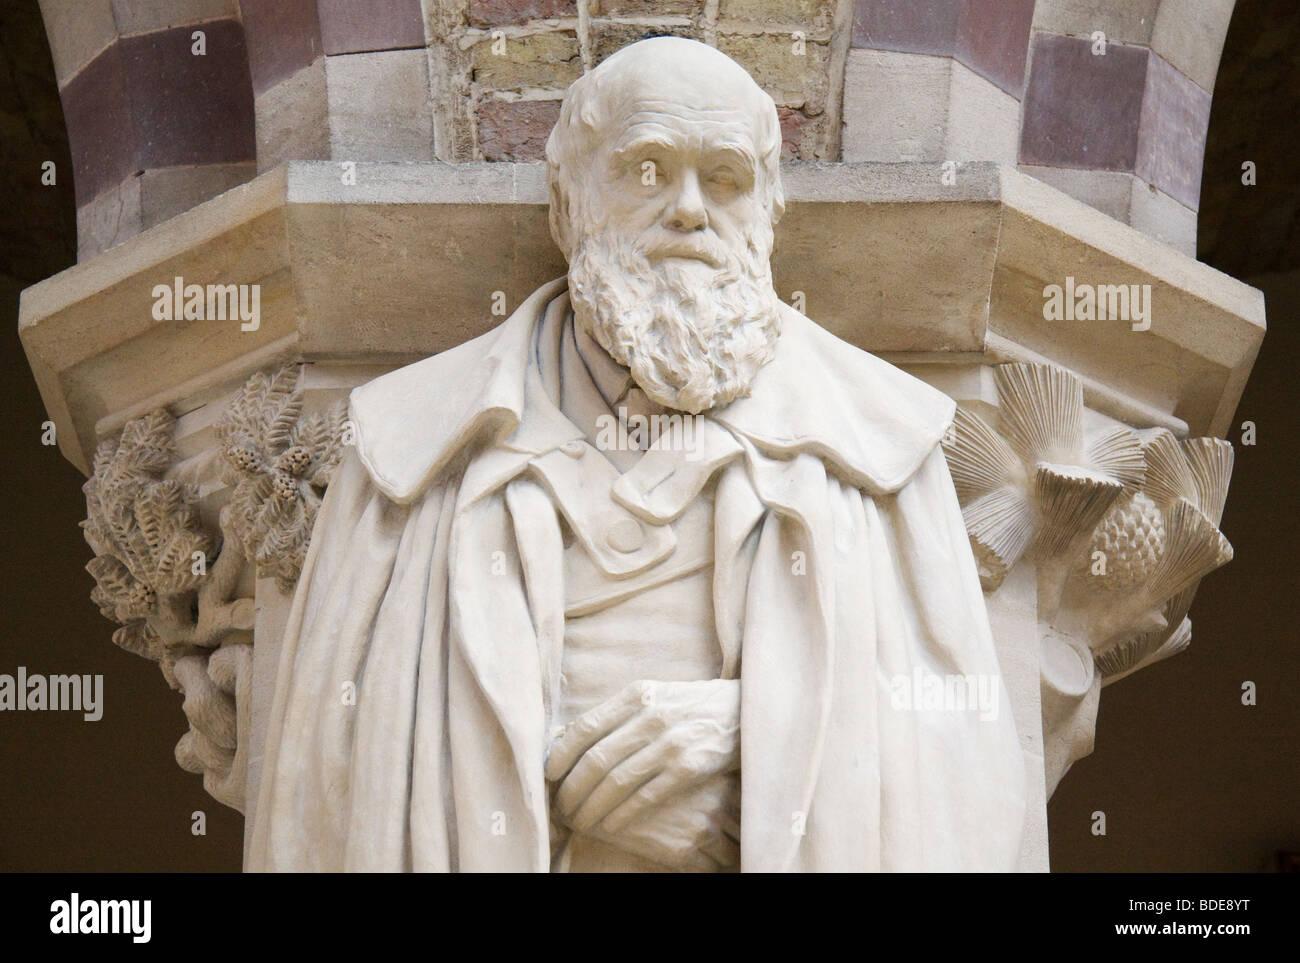 Statue of Darwin, Pitt Rivers Museum Oxford - Stock Image